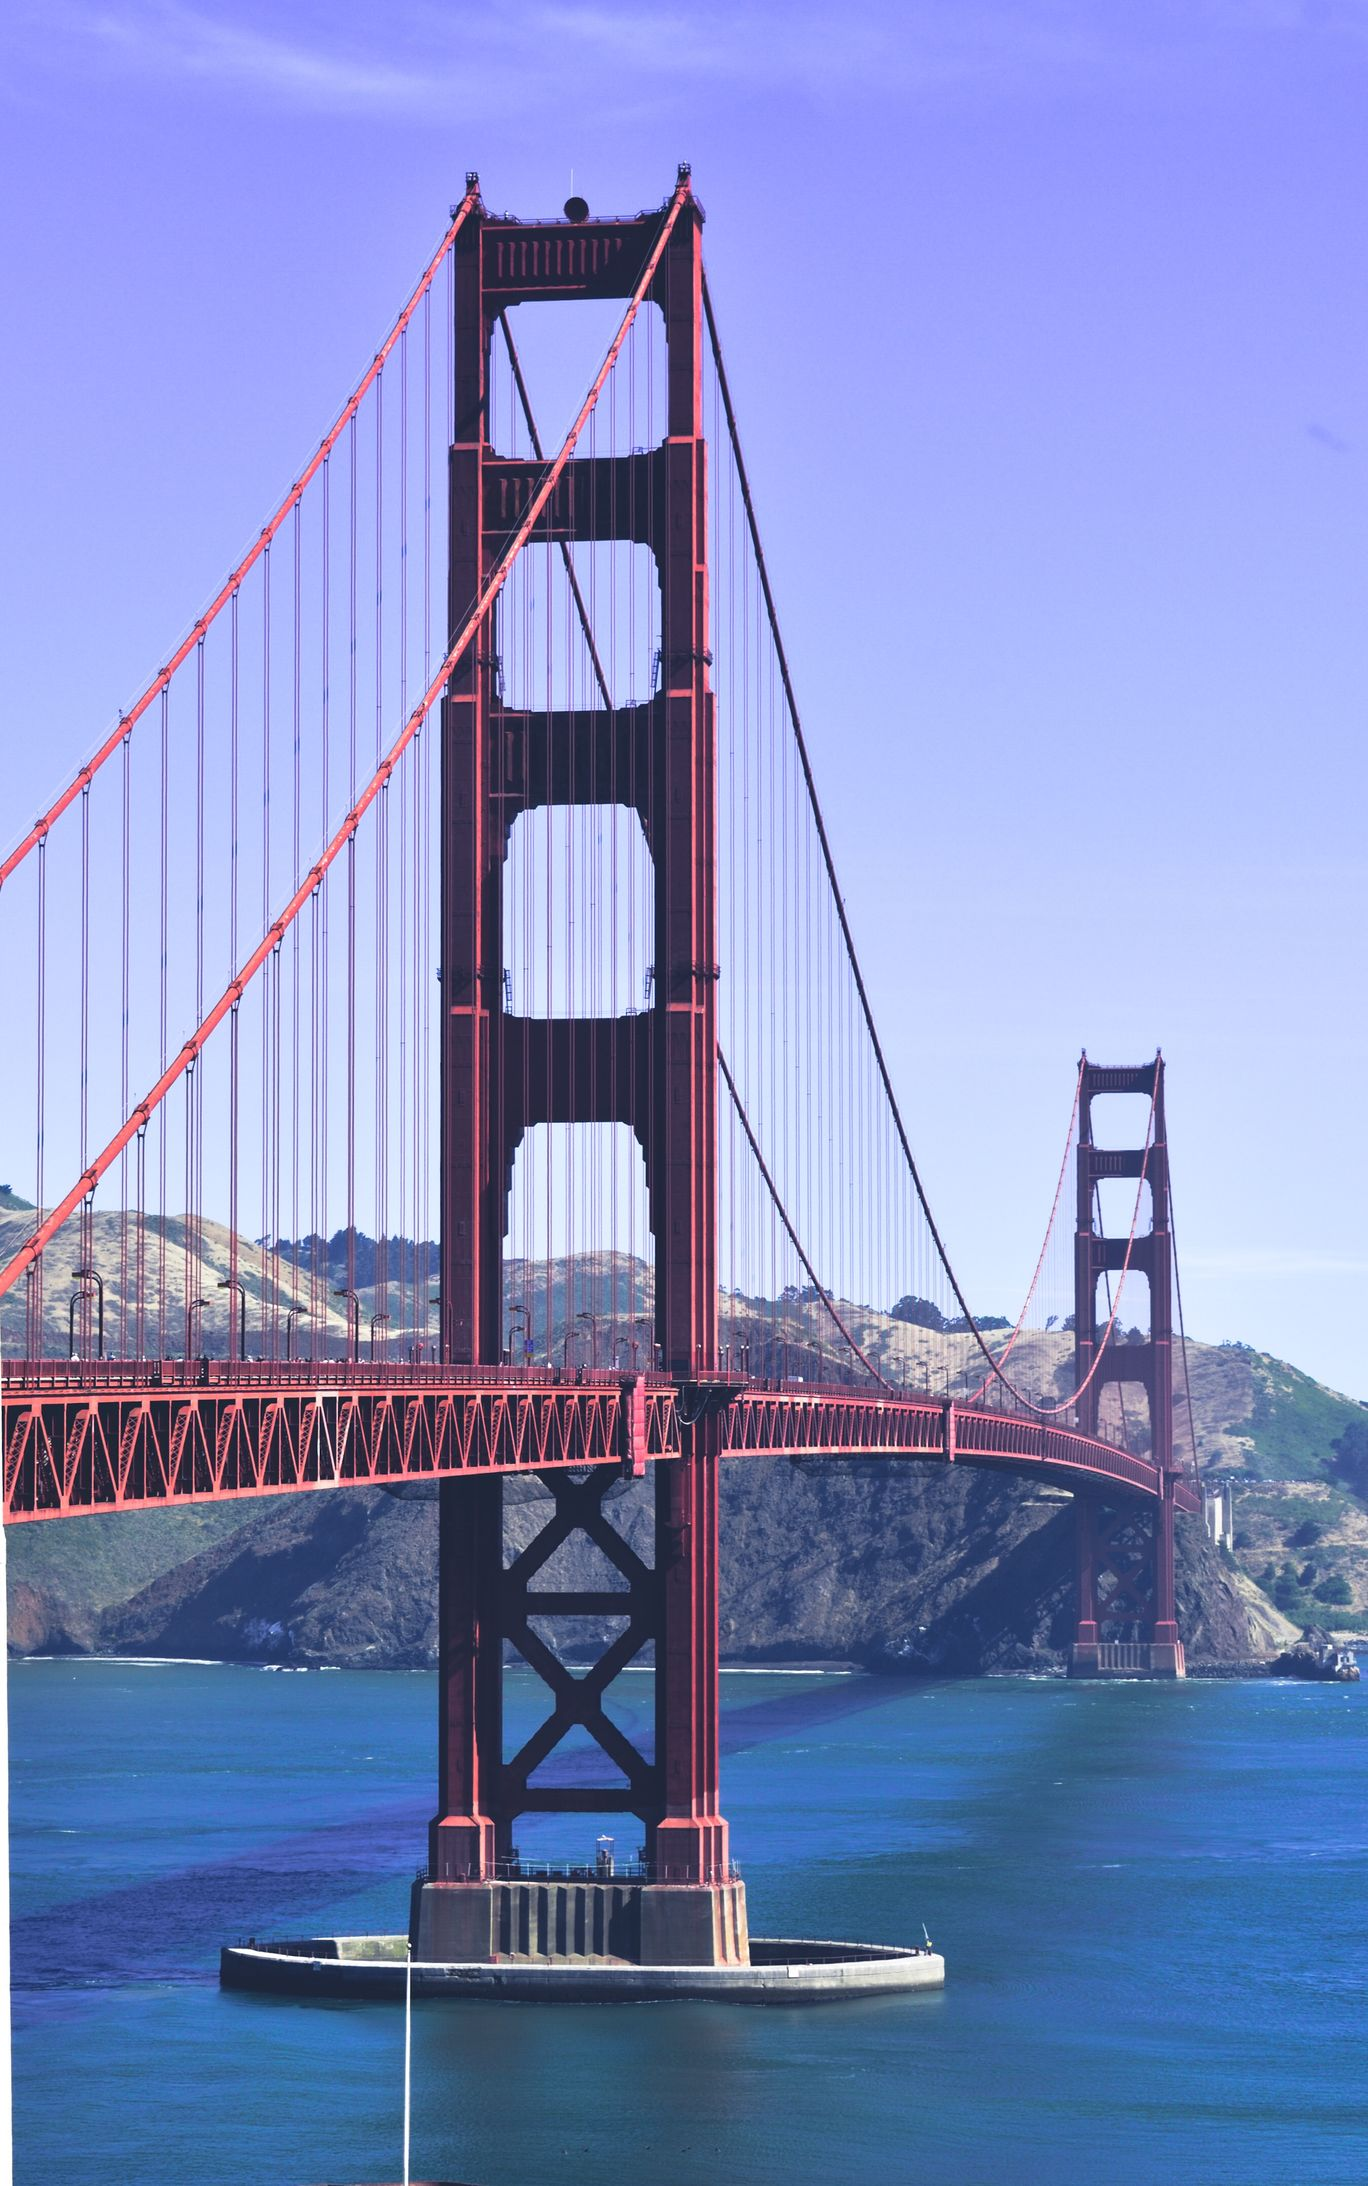 Photo of San Francisco By Chintan Patel